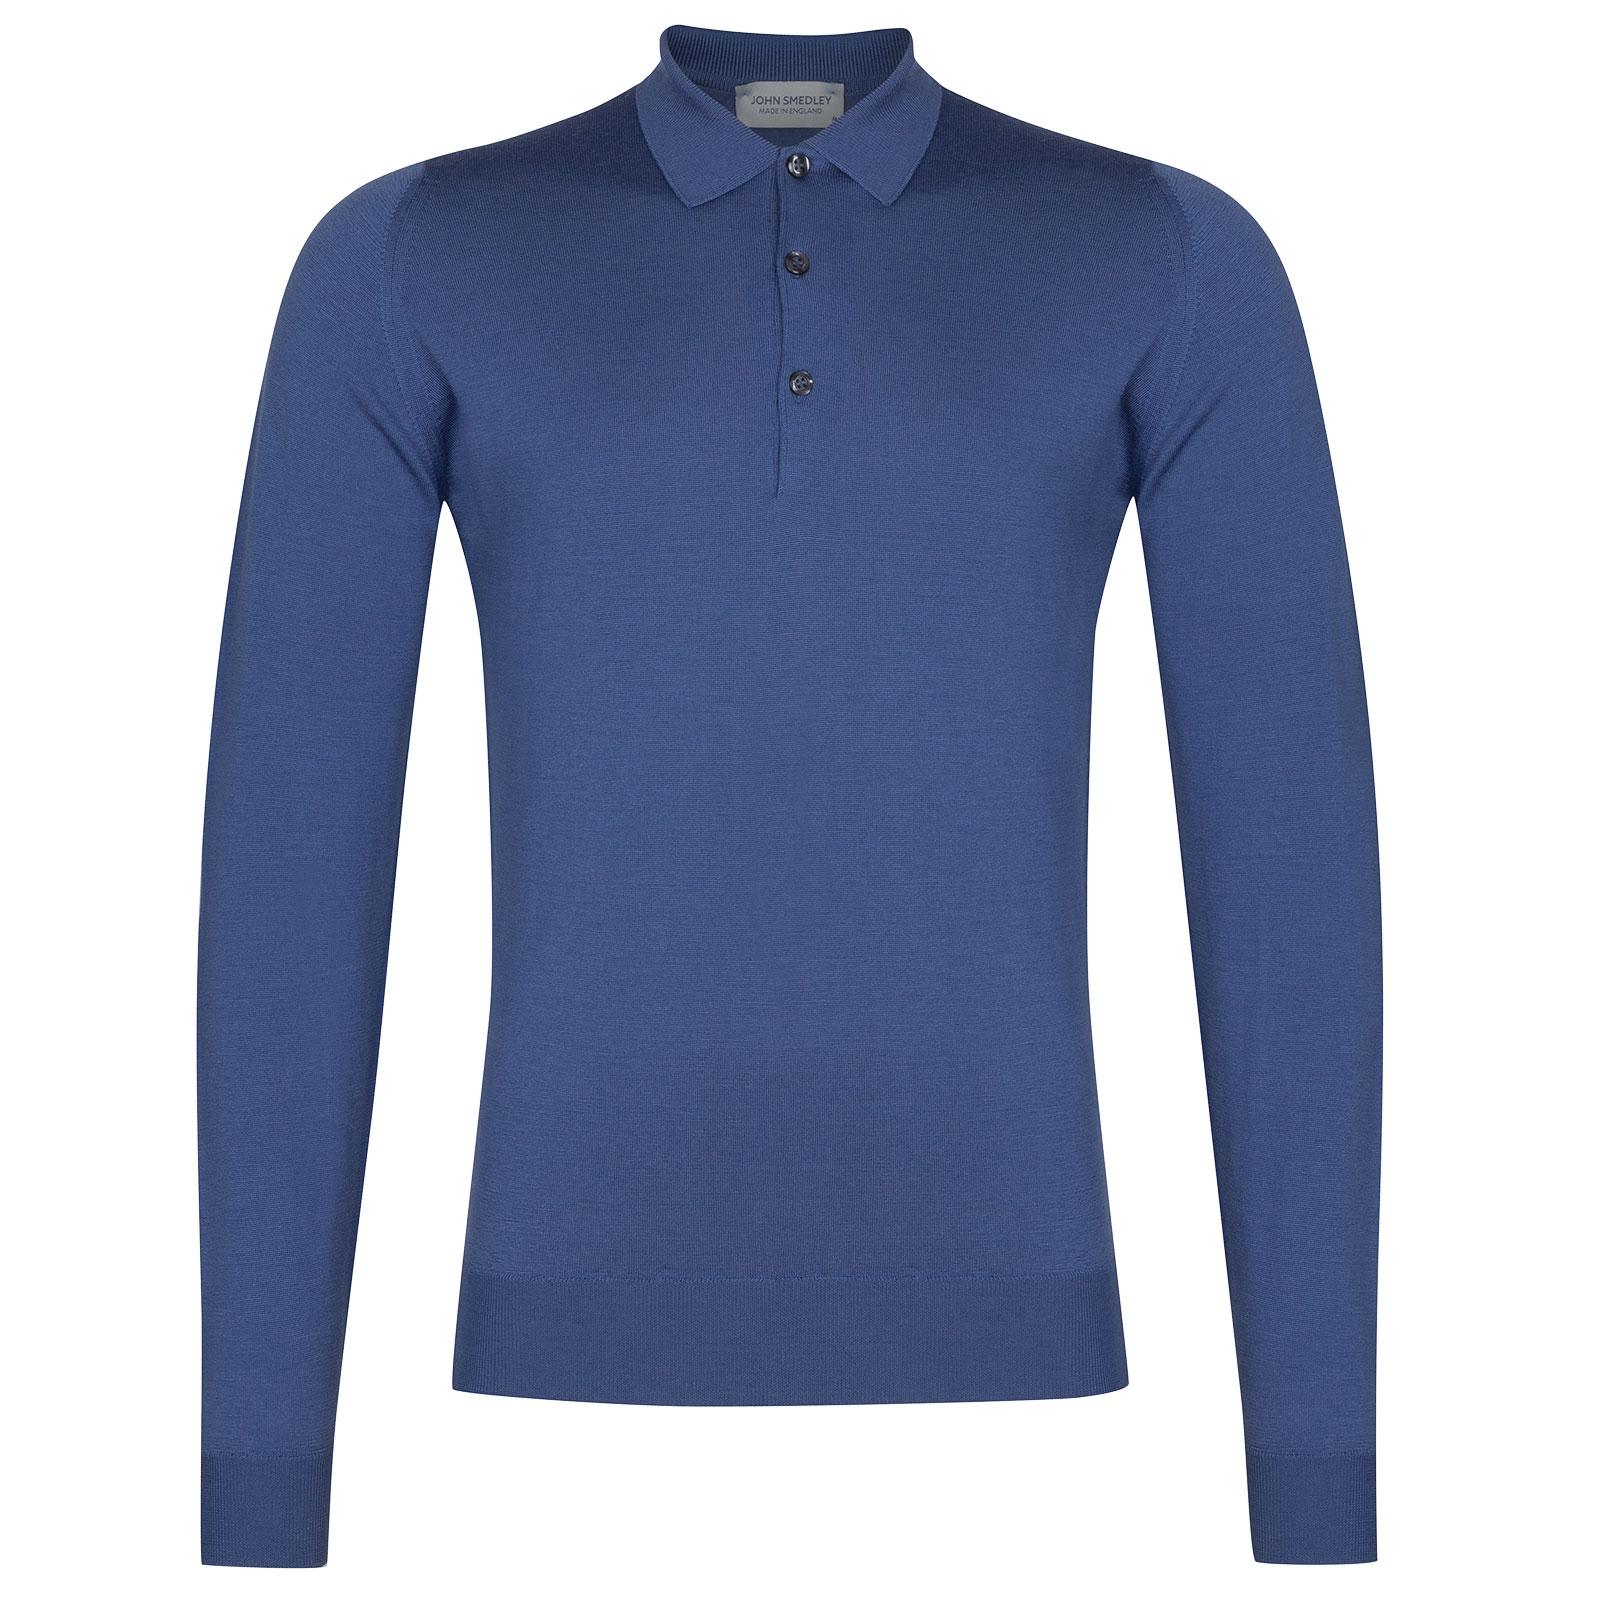 John Smedley Belper in Blue Iris Shirt-LGE